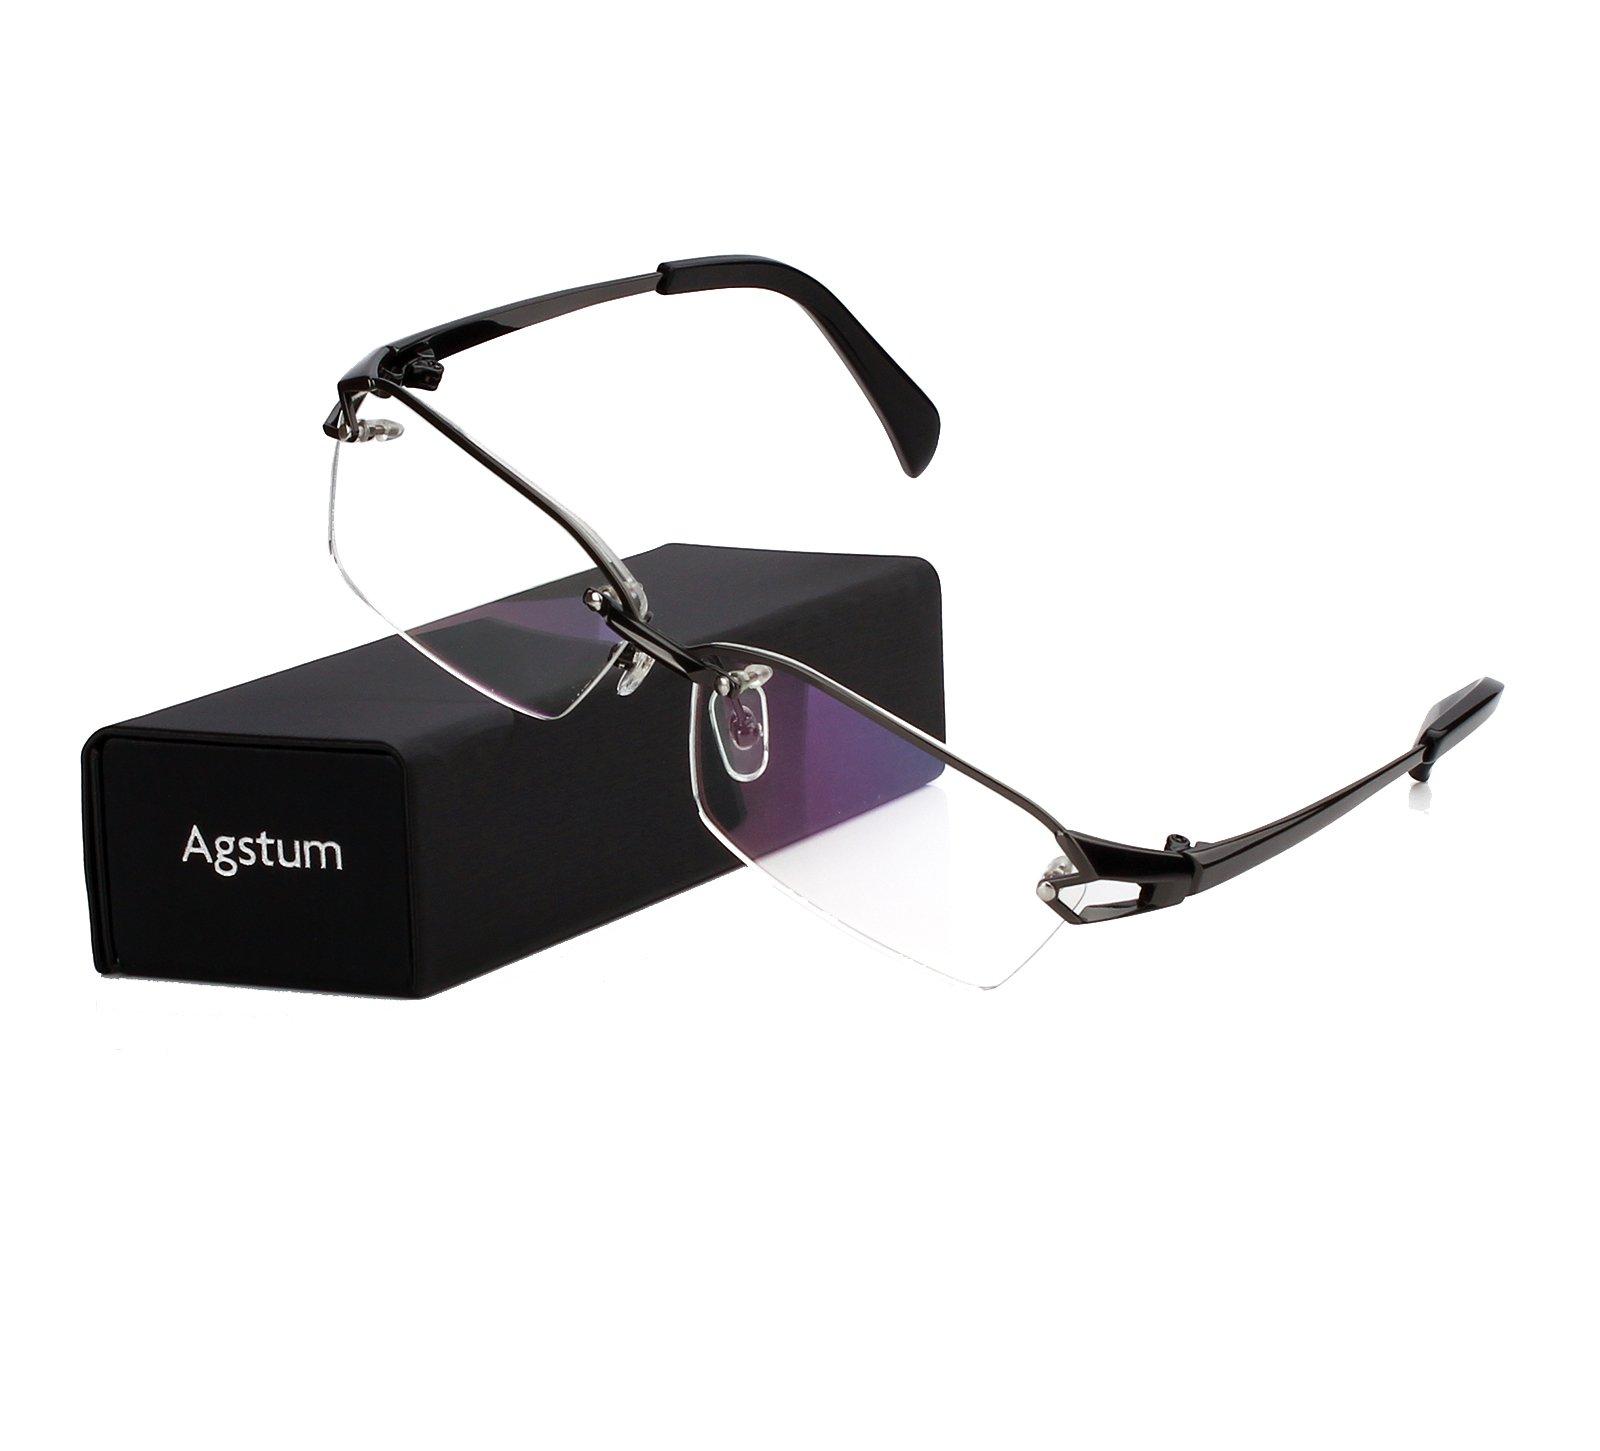 Agstum Pure Titanium Half Rimless Glasses Frame Optical Eyeglasses Clear Lens (Gunmetal, 58)